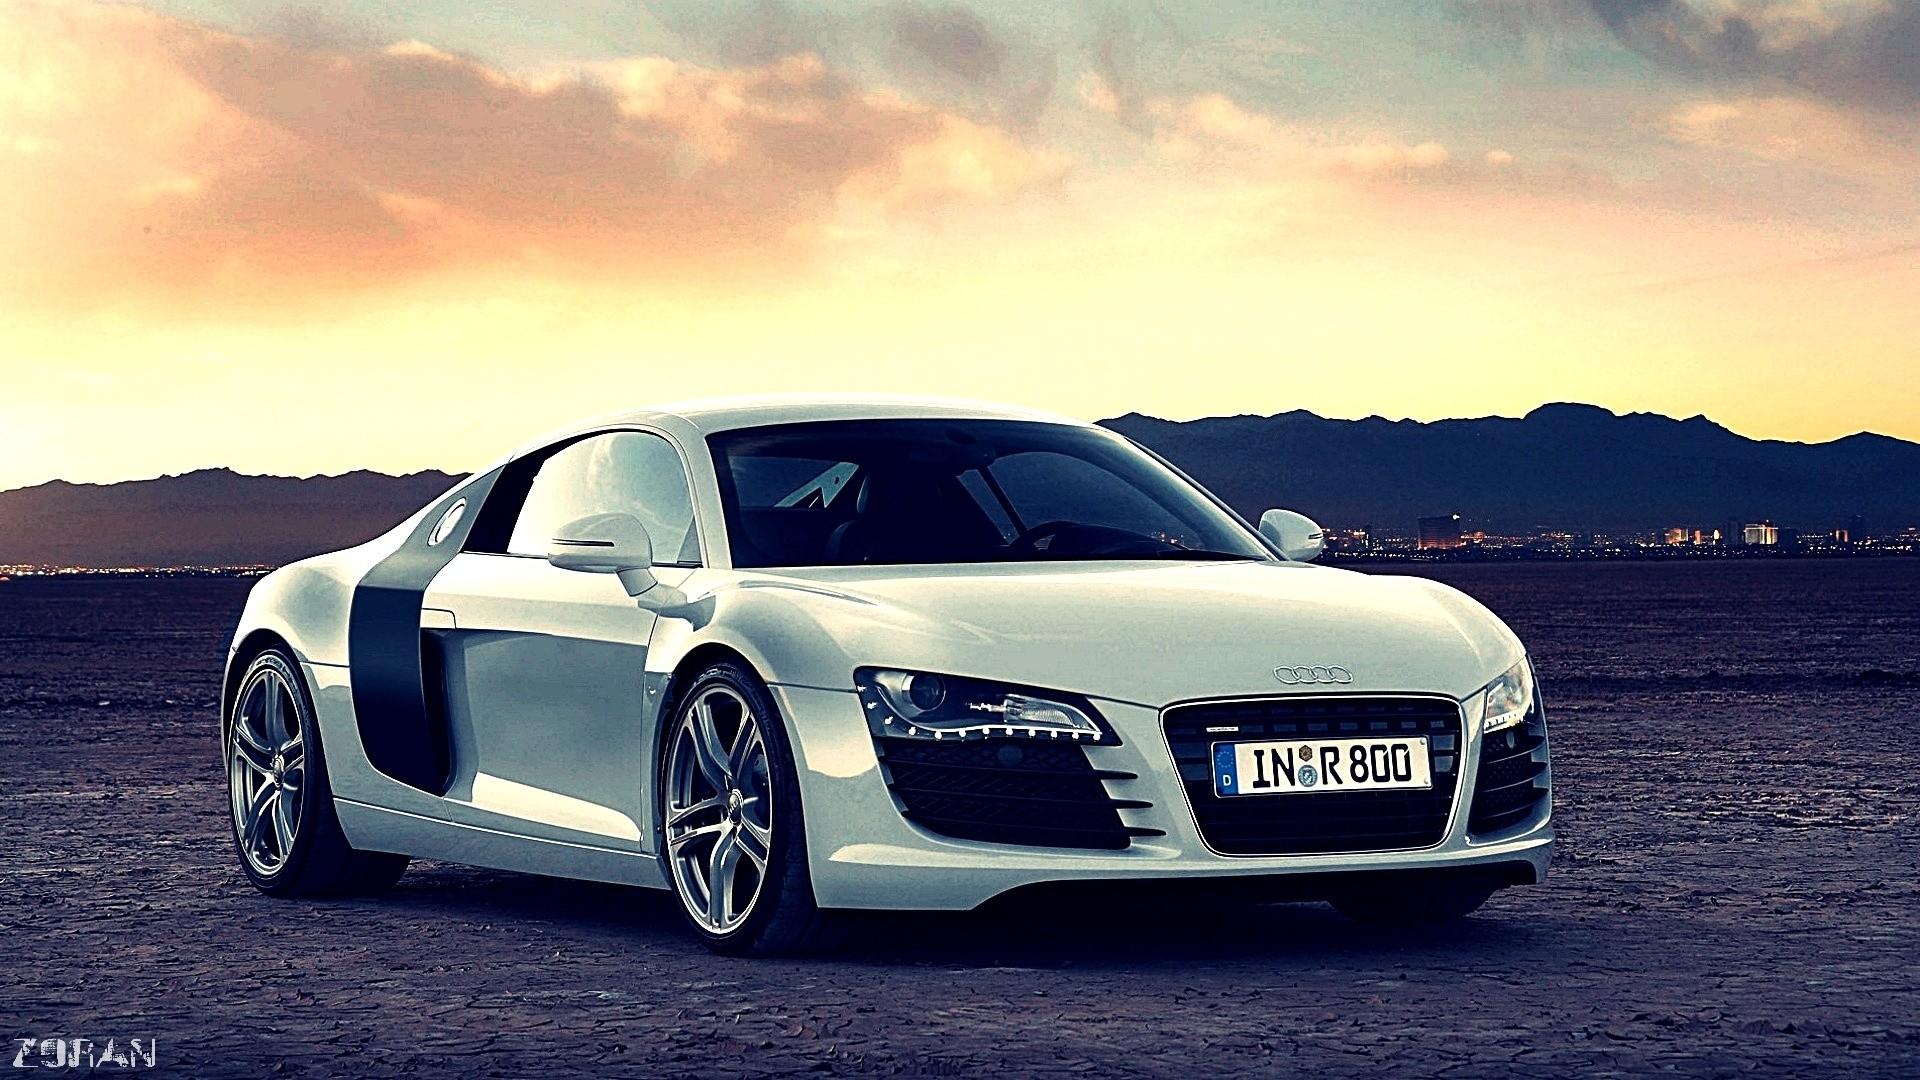 Hd Wallpaper Download Of Super Cars Desktop Backgrounds Cars 183 ①